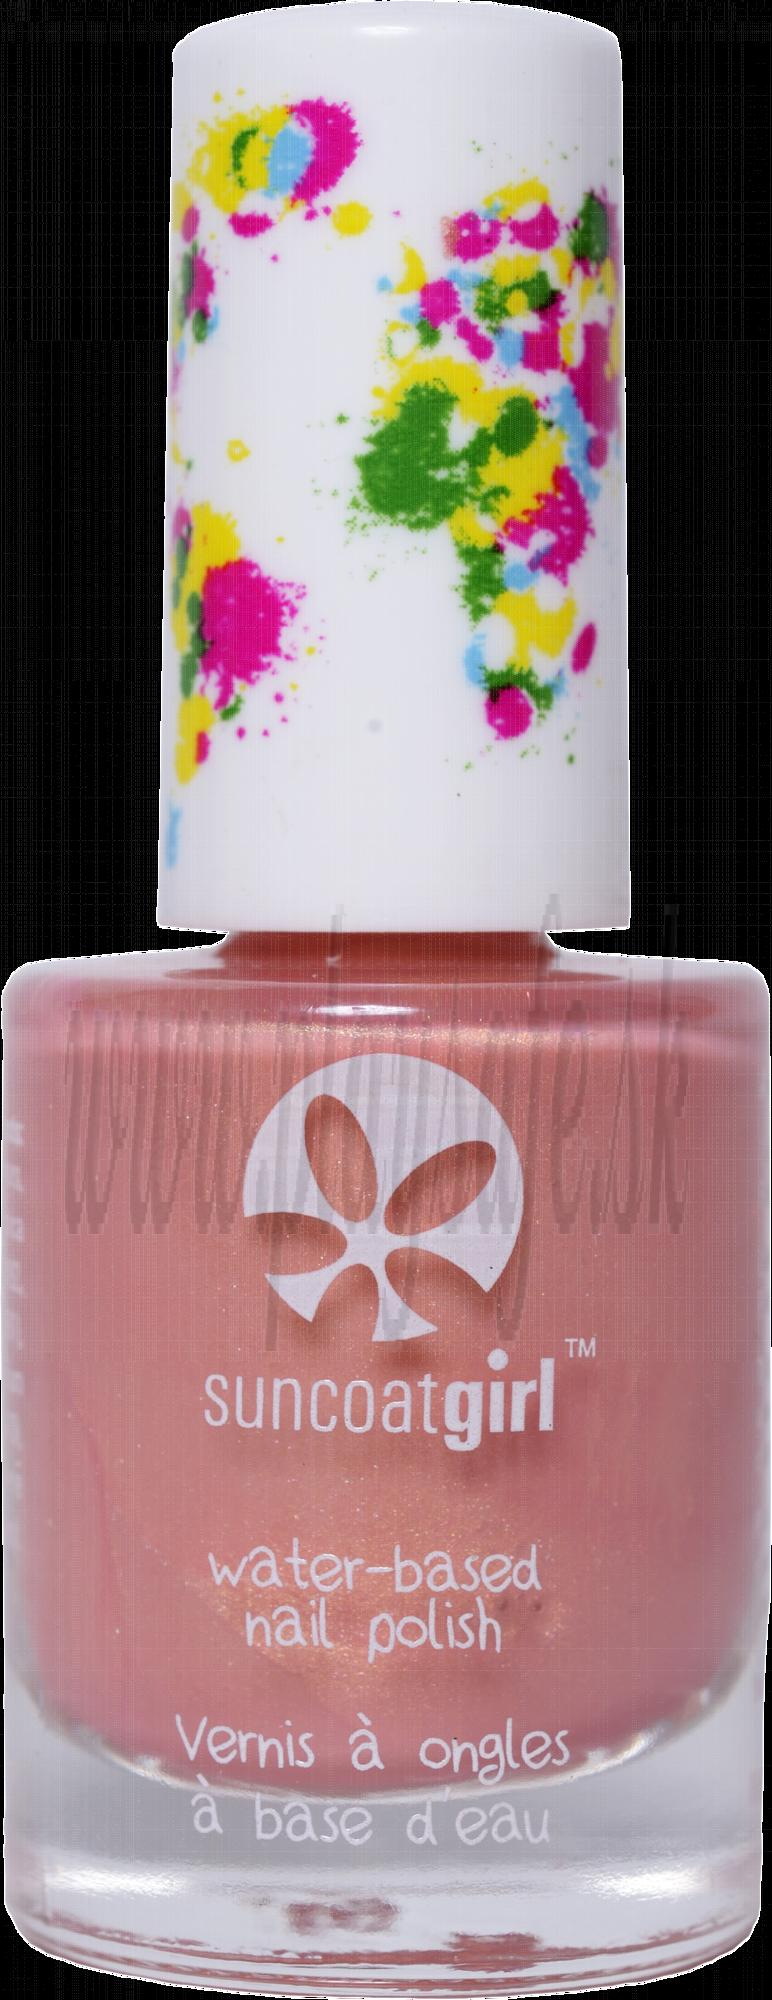 SuncoatGirl Nail Polish Delicious Peach, 9ml